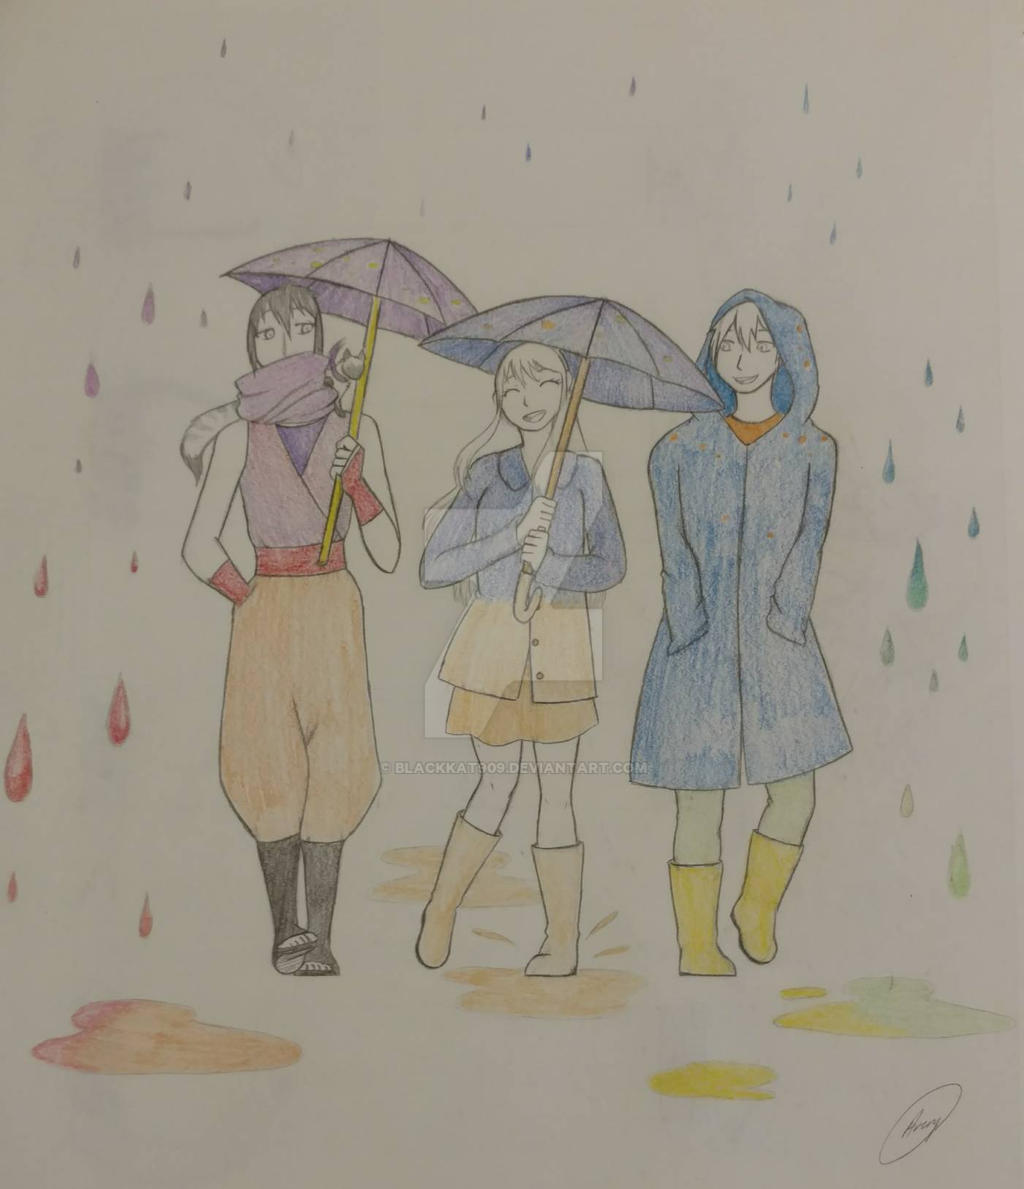 Rainy Day Color Wheel Art Class Project By Blackkat909 On Deviantart